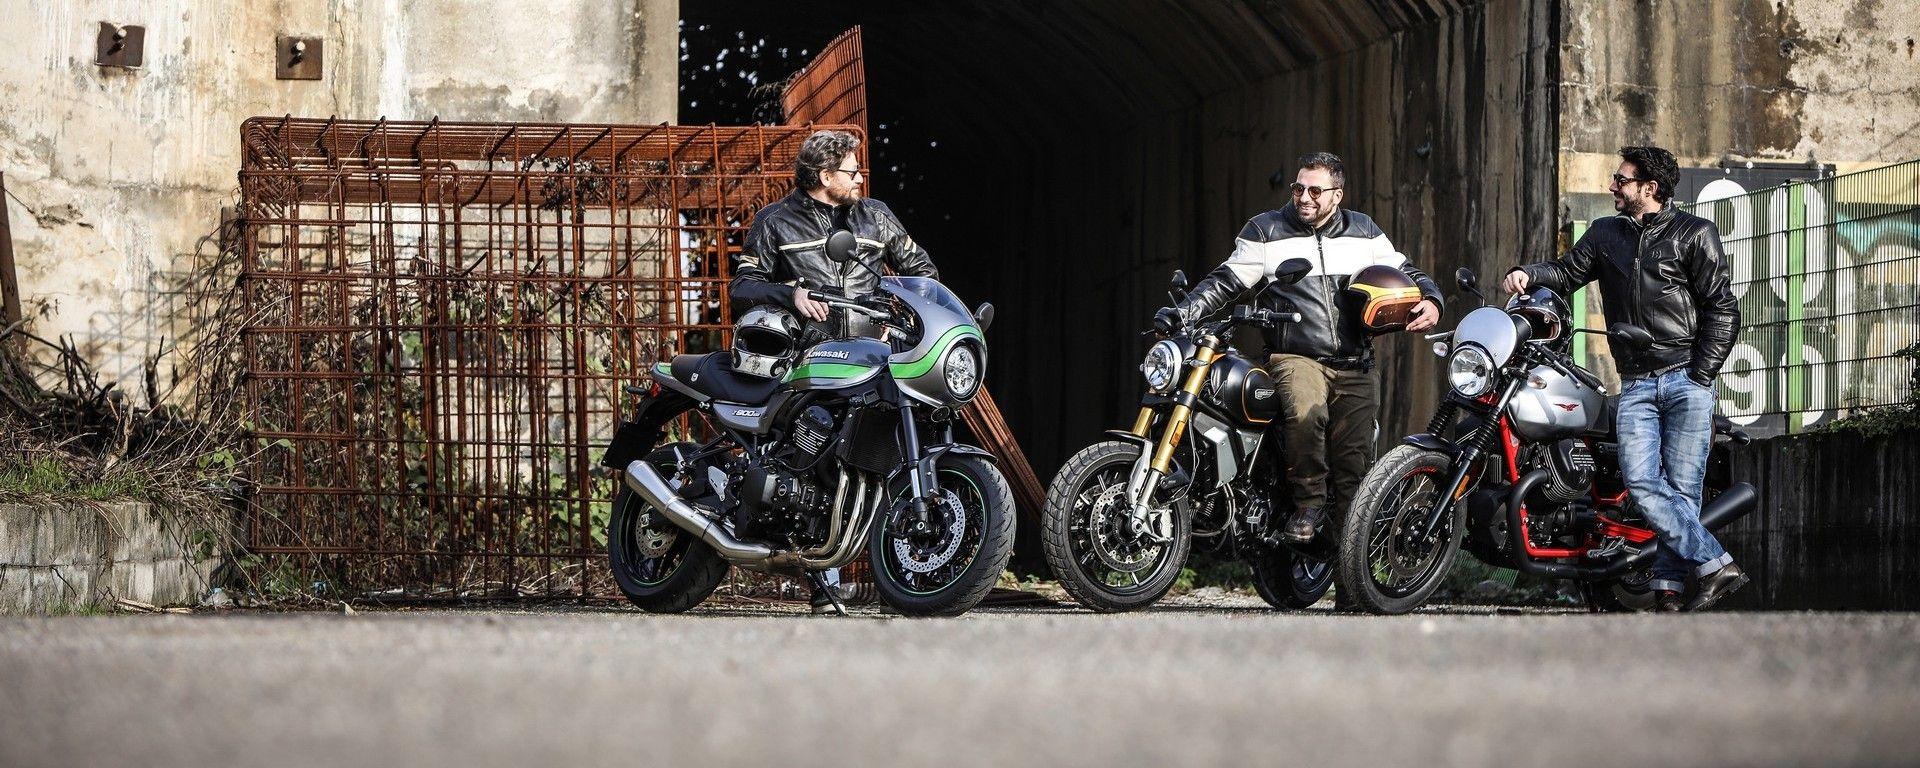 Kawasaki Z900 RS Cafe, Ducati Scrambler 1100, Guzzi V7 III Racer a confronto